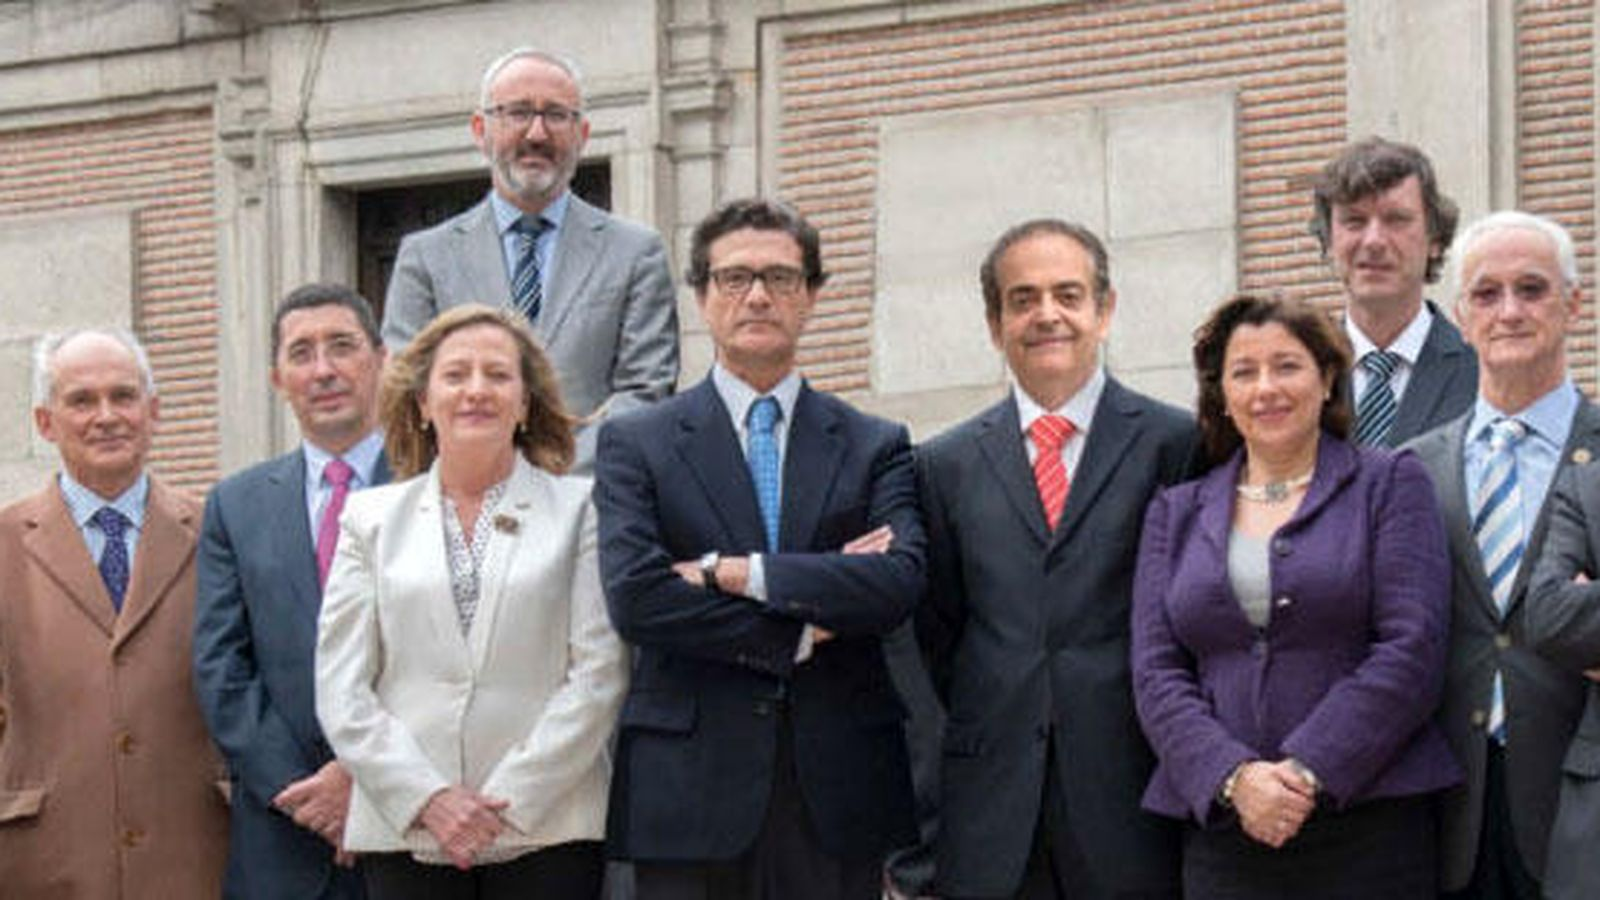 Foto: Candidatura encabezada por Pascual Fernández  (centro).